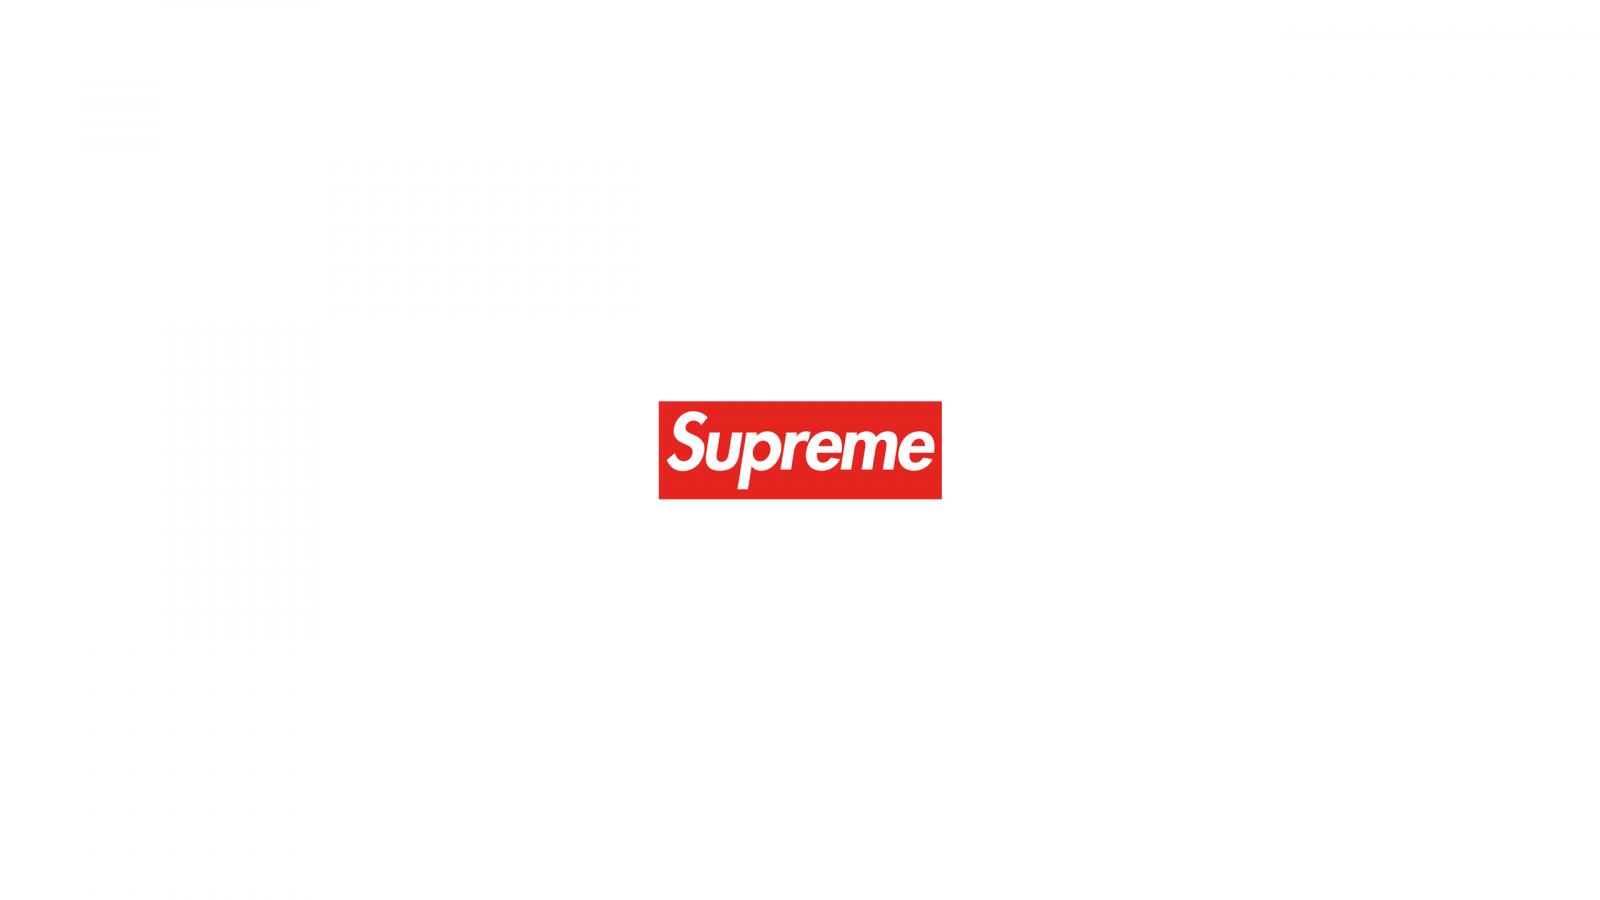 Wallpaper : supreme, clothes 2560x1440 - gubbin - 1412259 ...